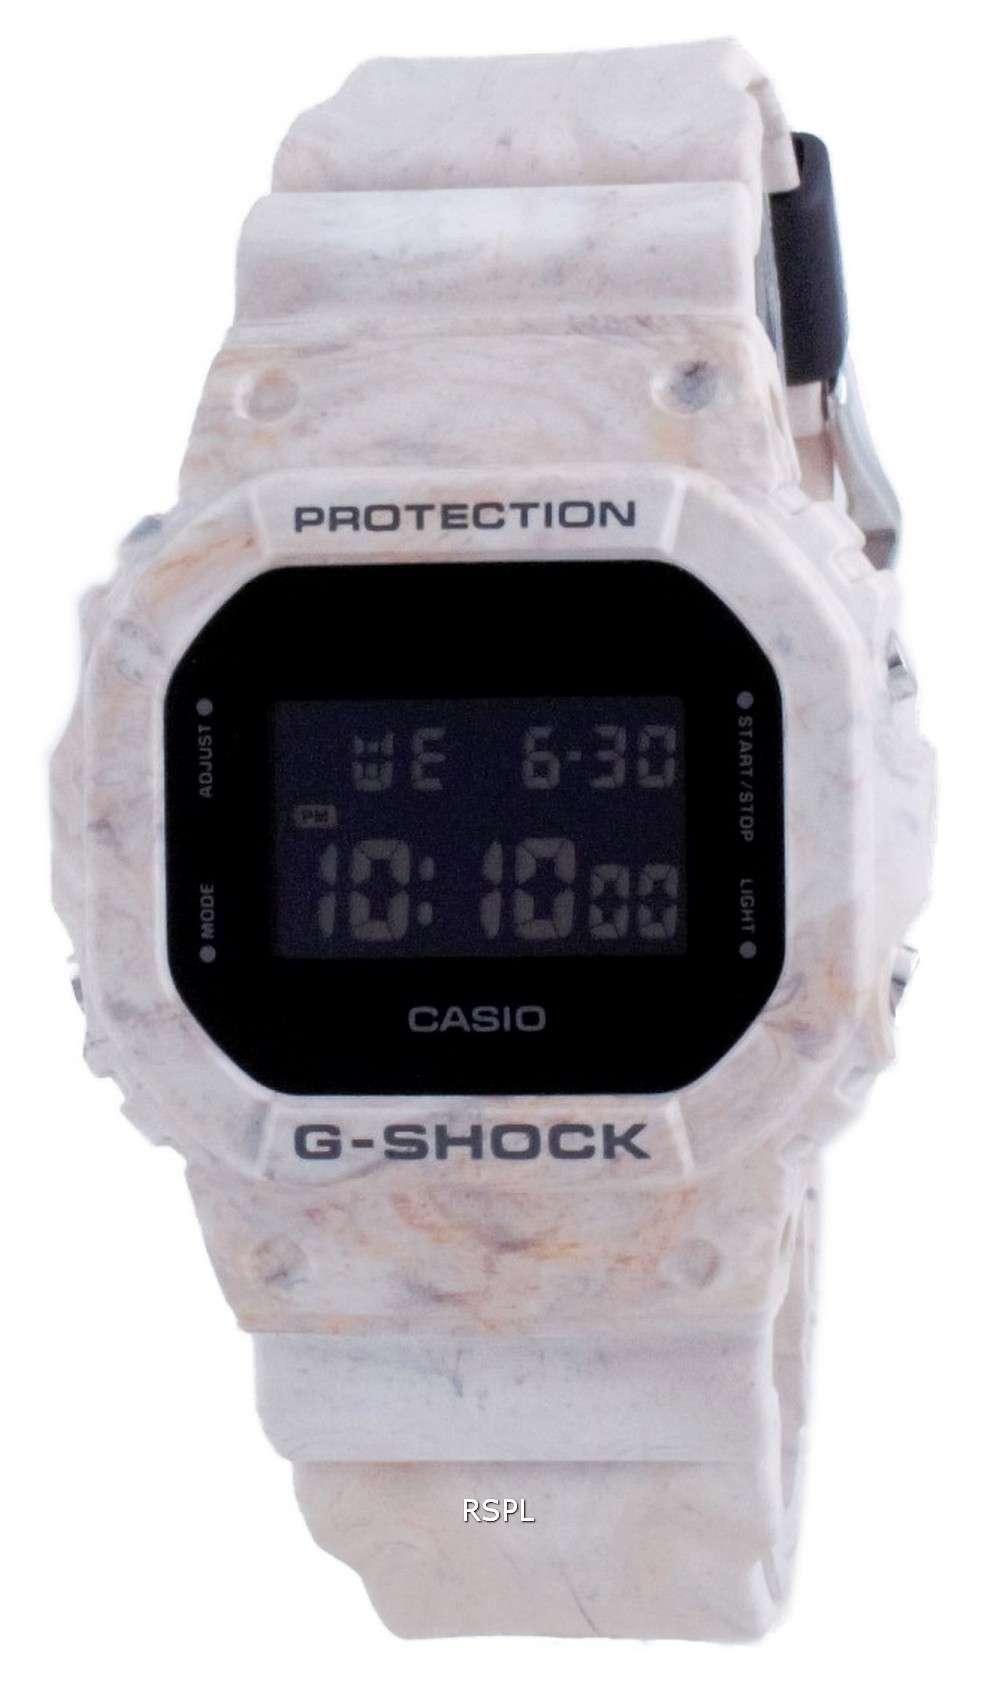 Reloj Casio G-Shock Utility Wavy Marble Digital Diver&#39,s DW-5600WM-5 DW5600WM-5 200M para hombre